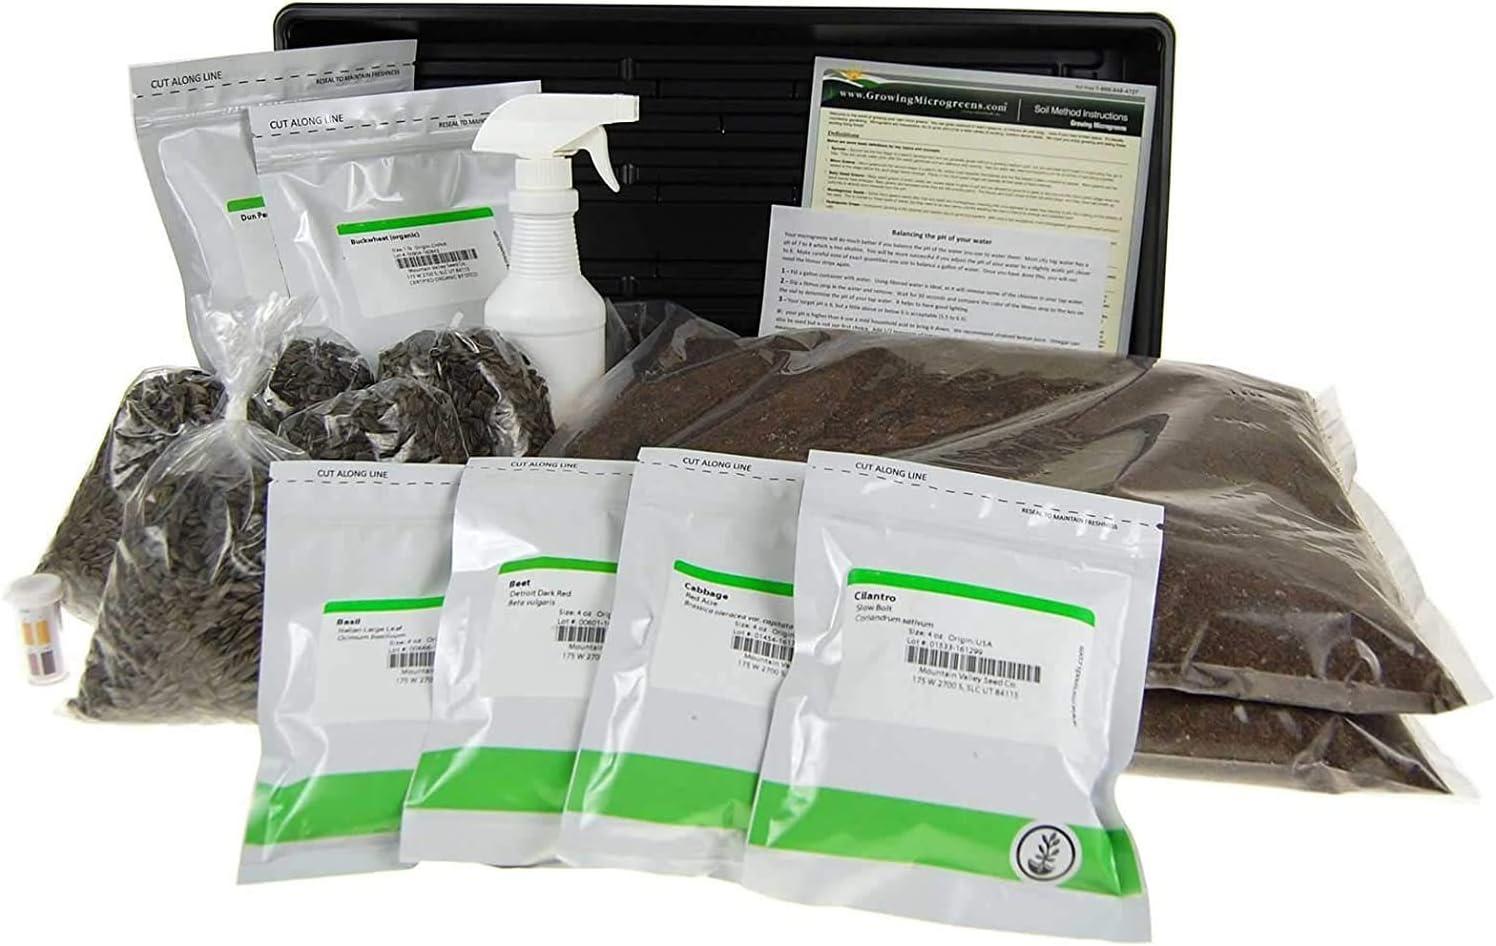 Microgreens Growing Kit - Grow Micro Greens & Baby Salad - Soil Based Indoor Garden: Sunflower, Buckwheat, Pea & More